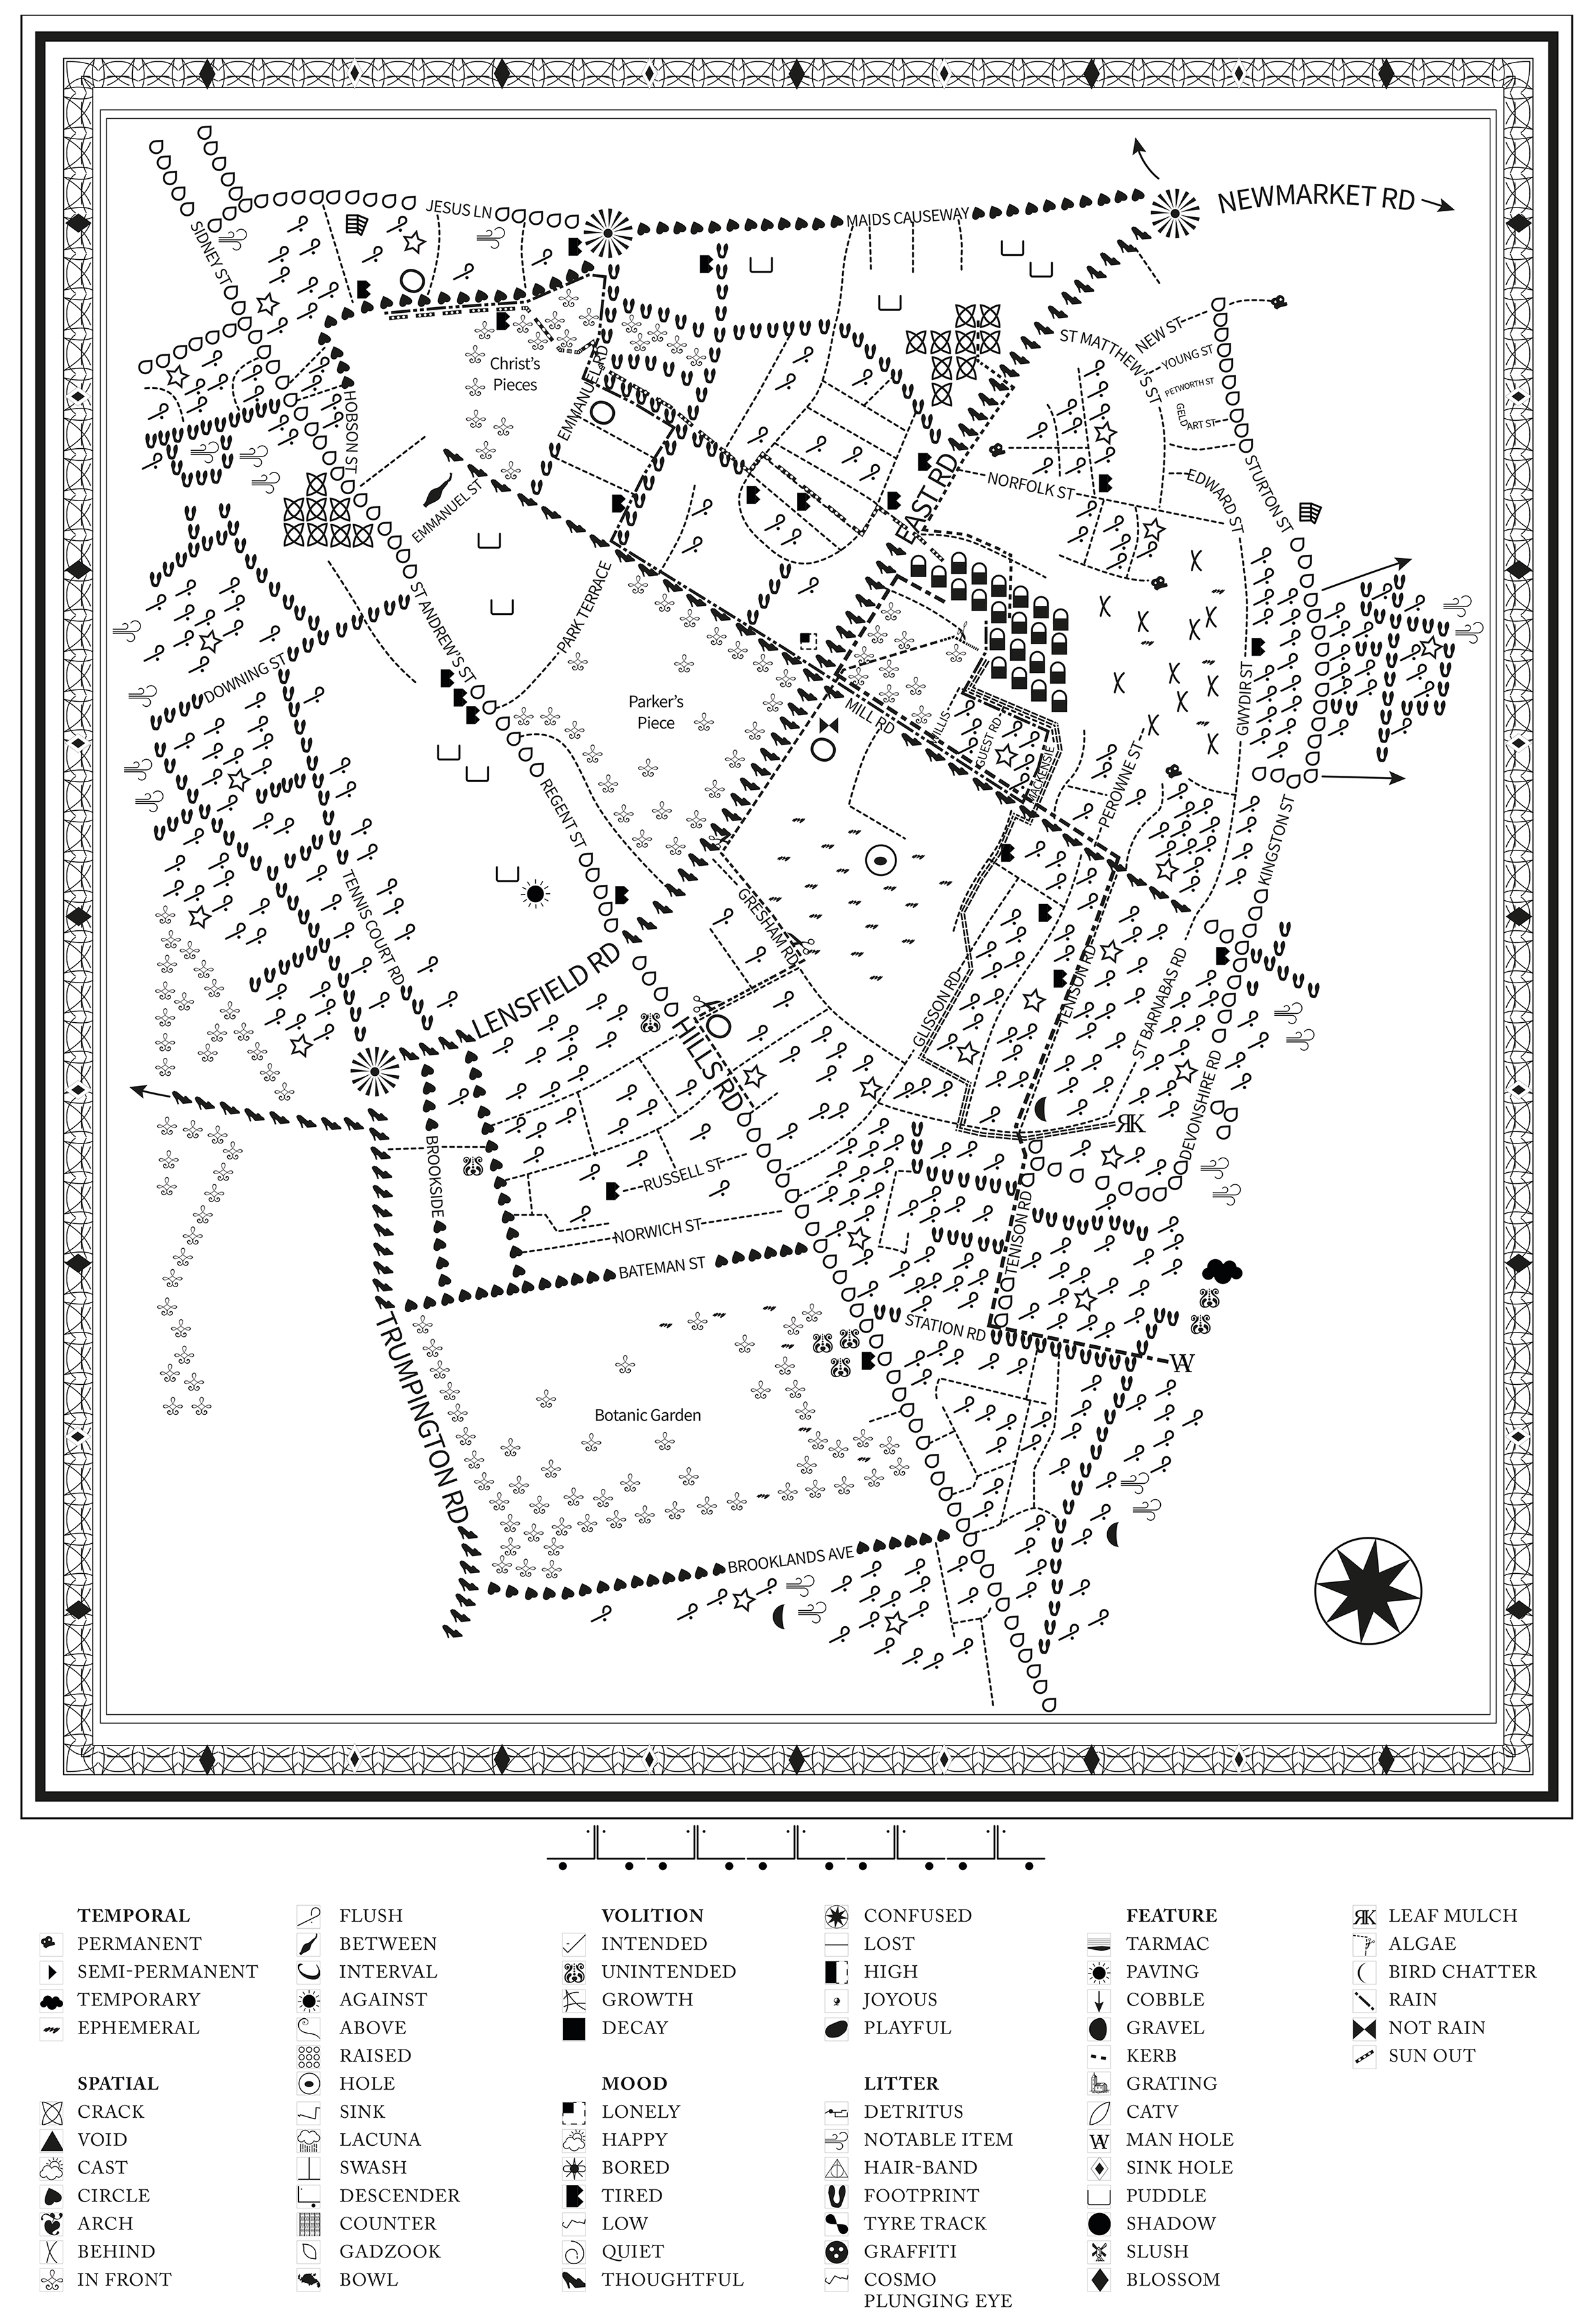 Wainwright_map860x580.jpg